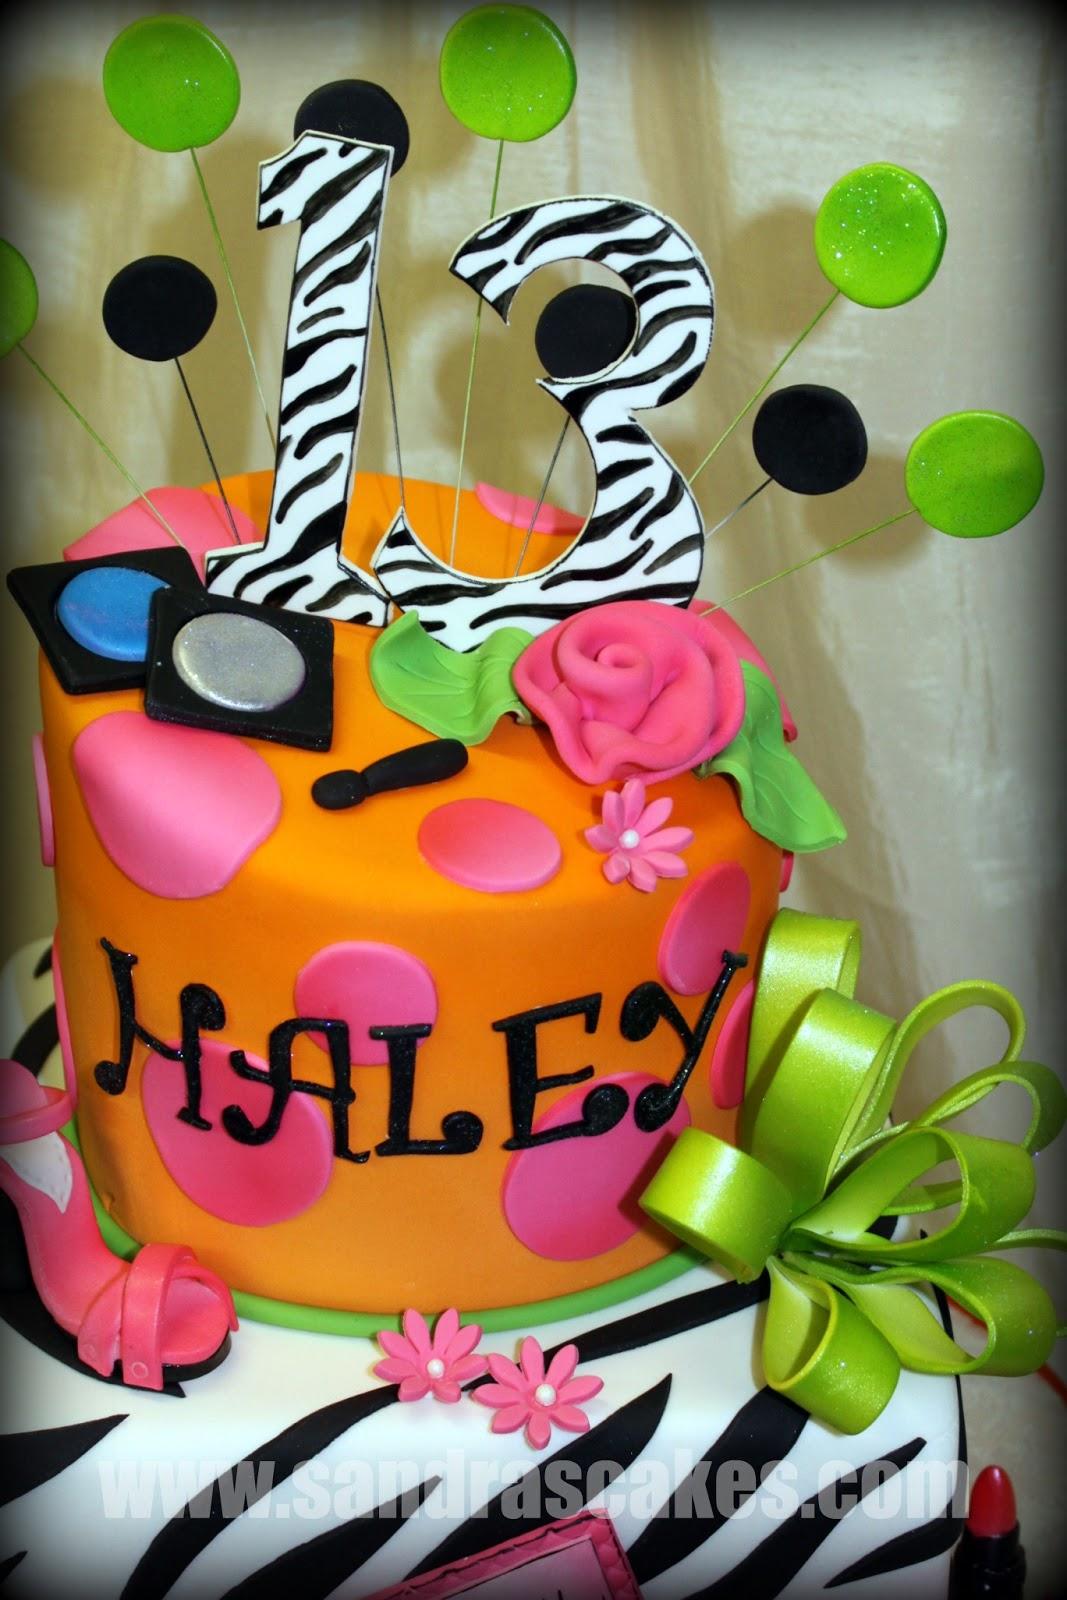 Fun And Colorful 13th Birthday Cake